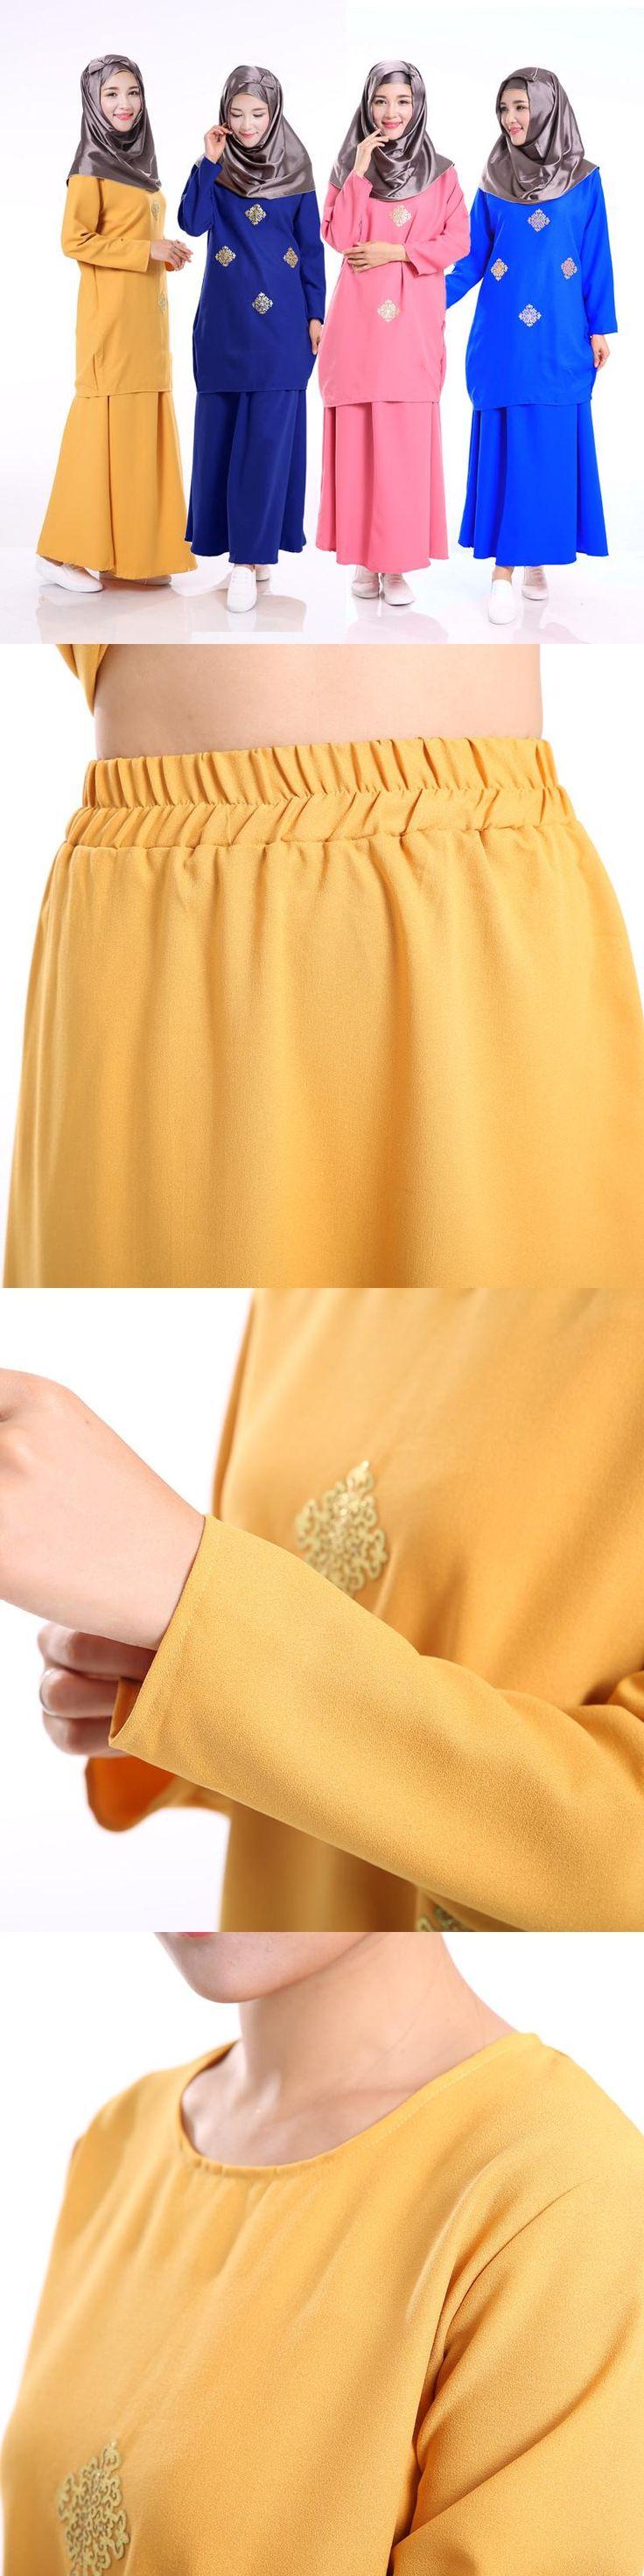 Muslim Fashion Sets prayer Sun hemp Skirt pants islamitische islami summer dress Arab for woman dubai girls Iran clothing Oman